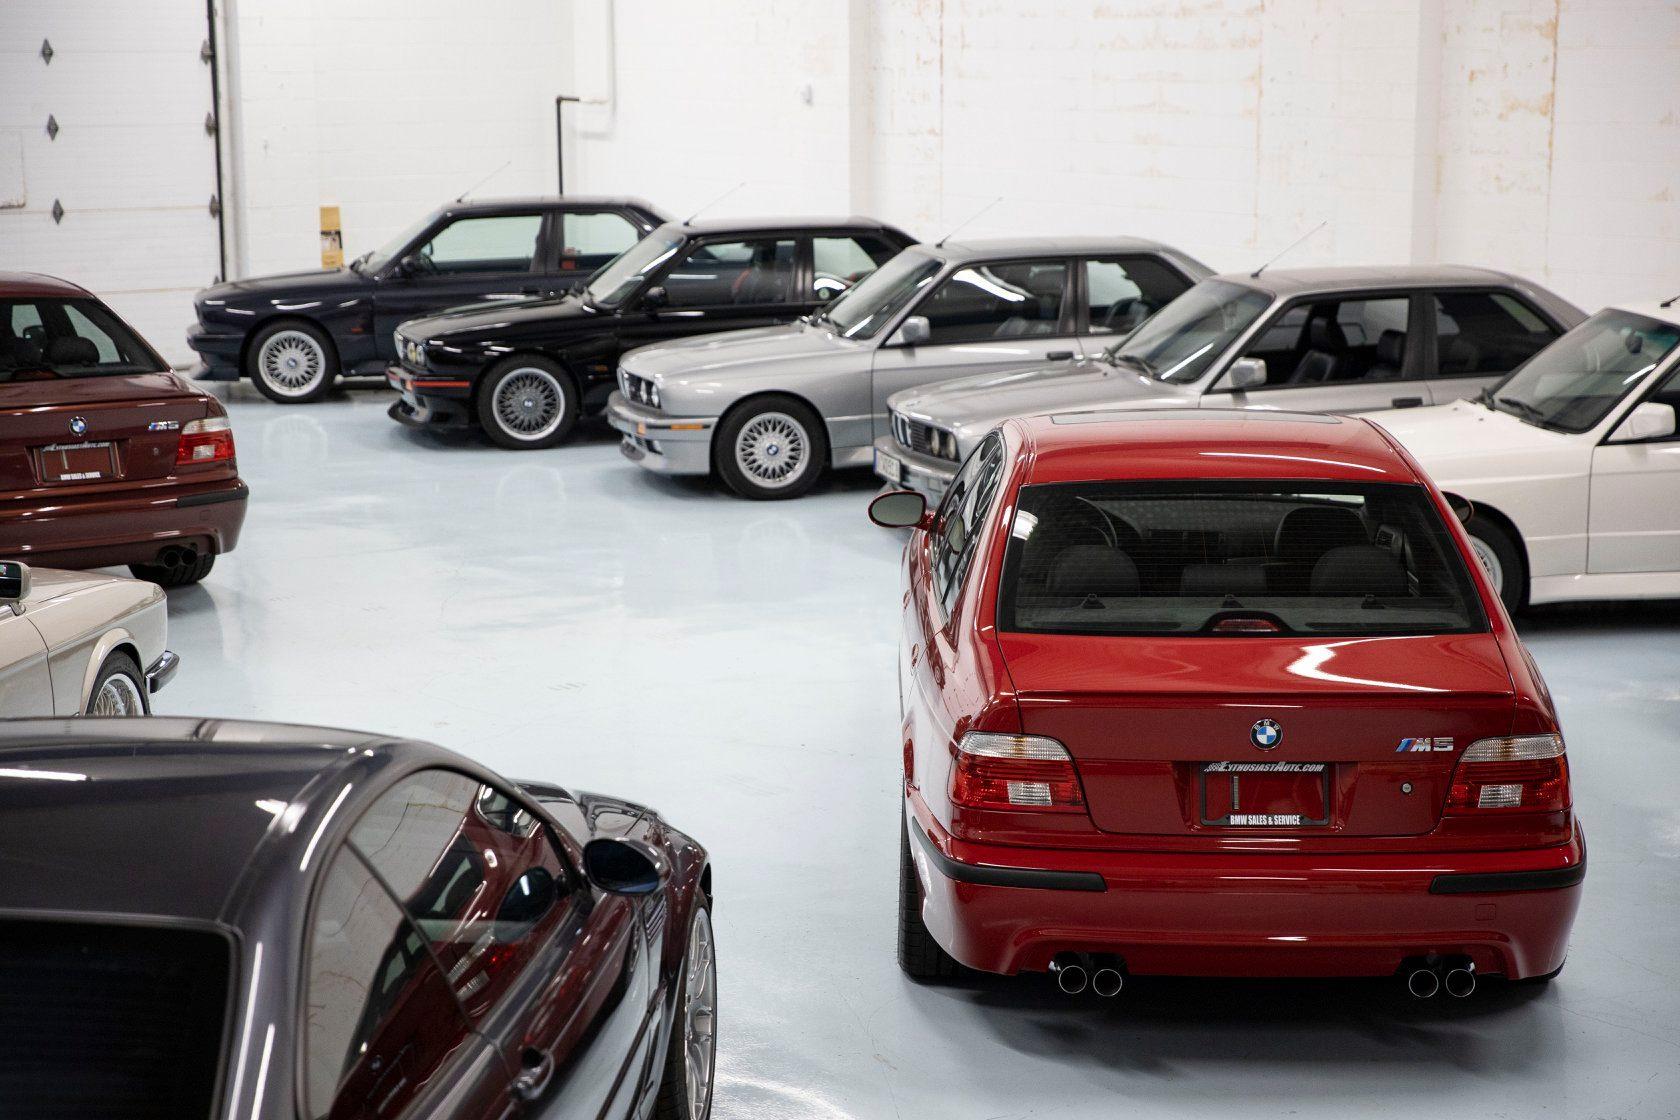 BMW_M5_E39_Imola_Red_0009